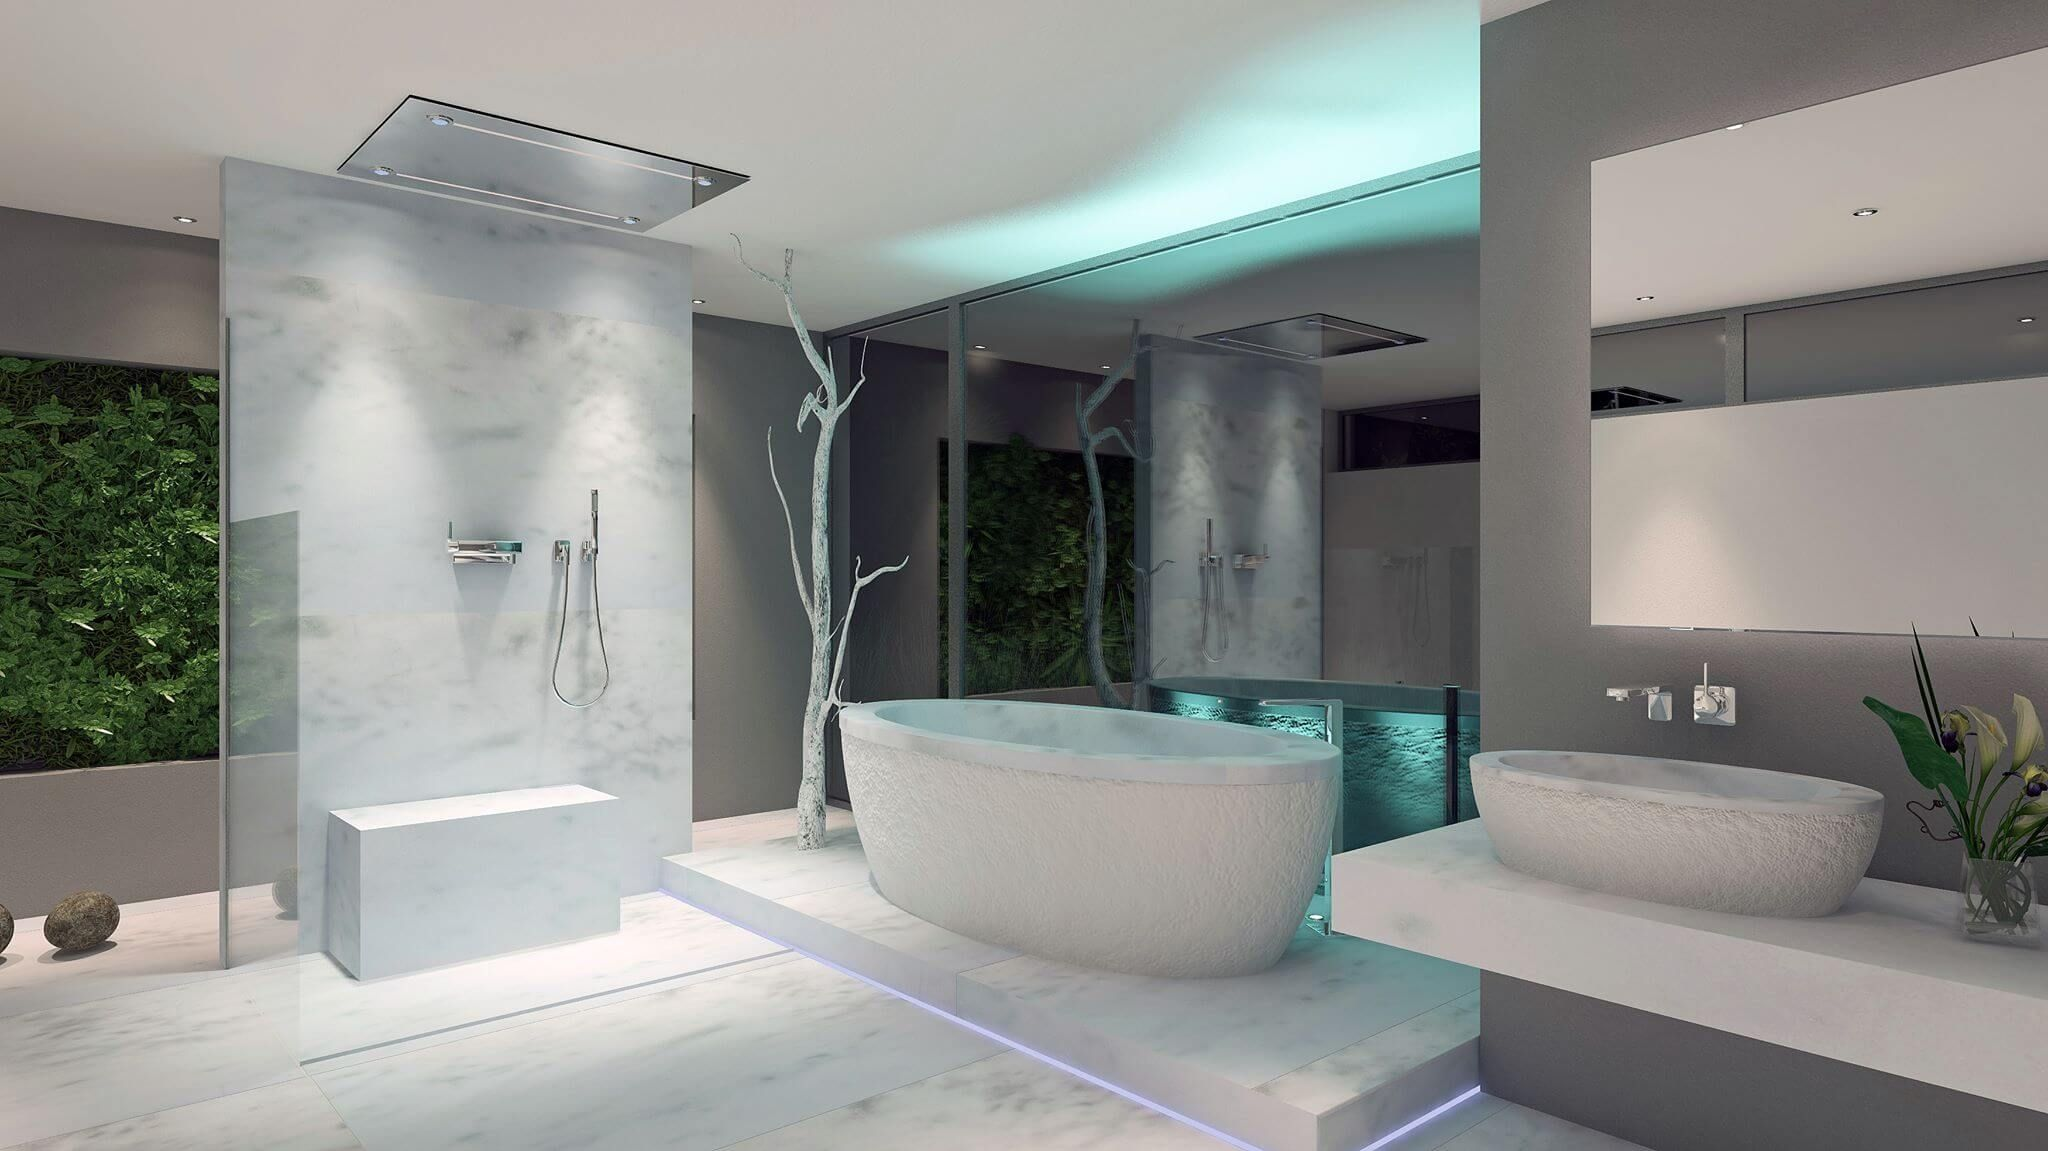 Neu Badezimmer Dusche Design Bilder Badezimmerschrank